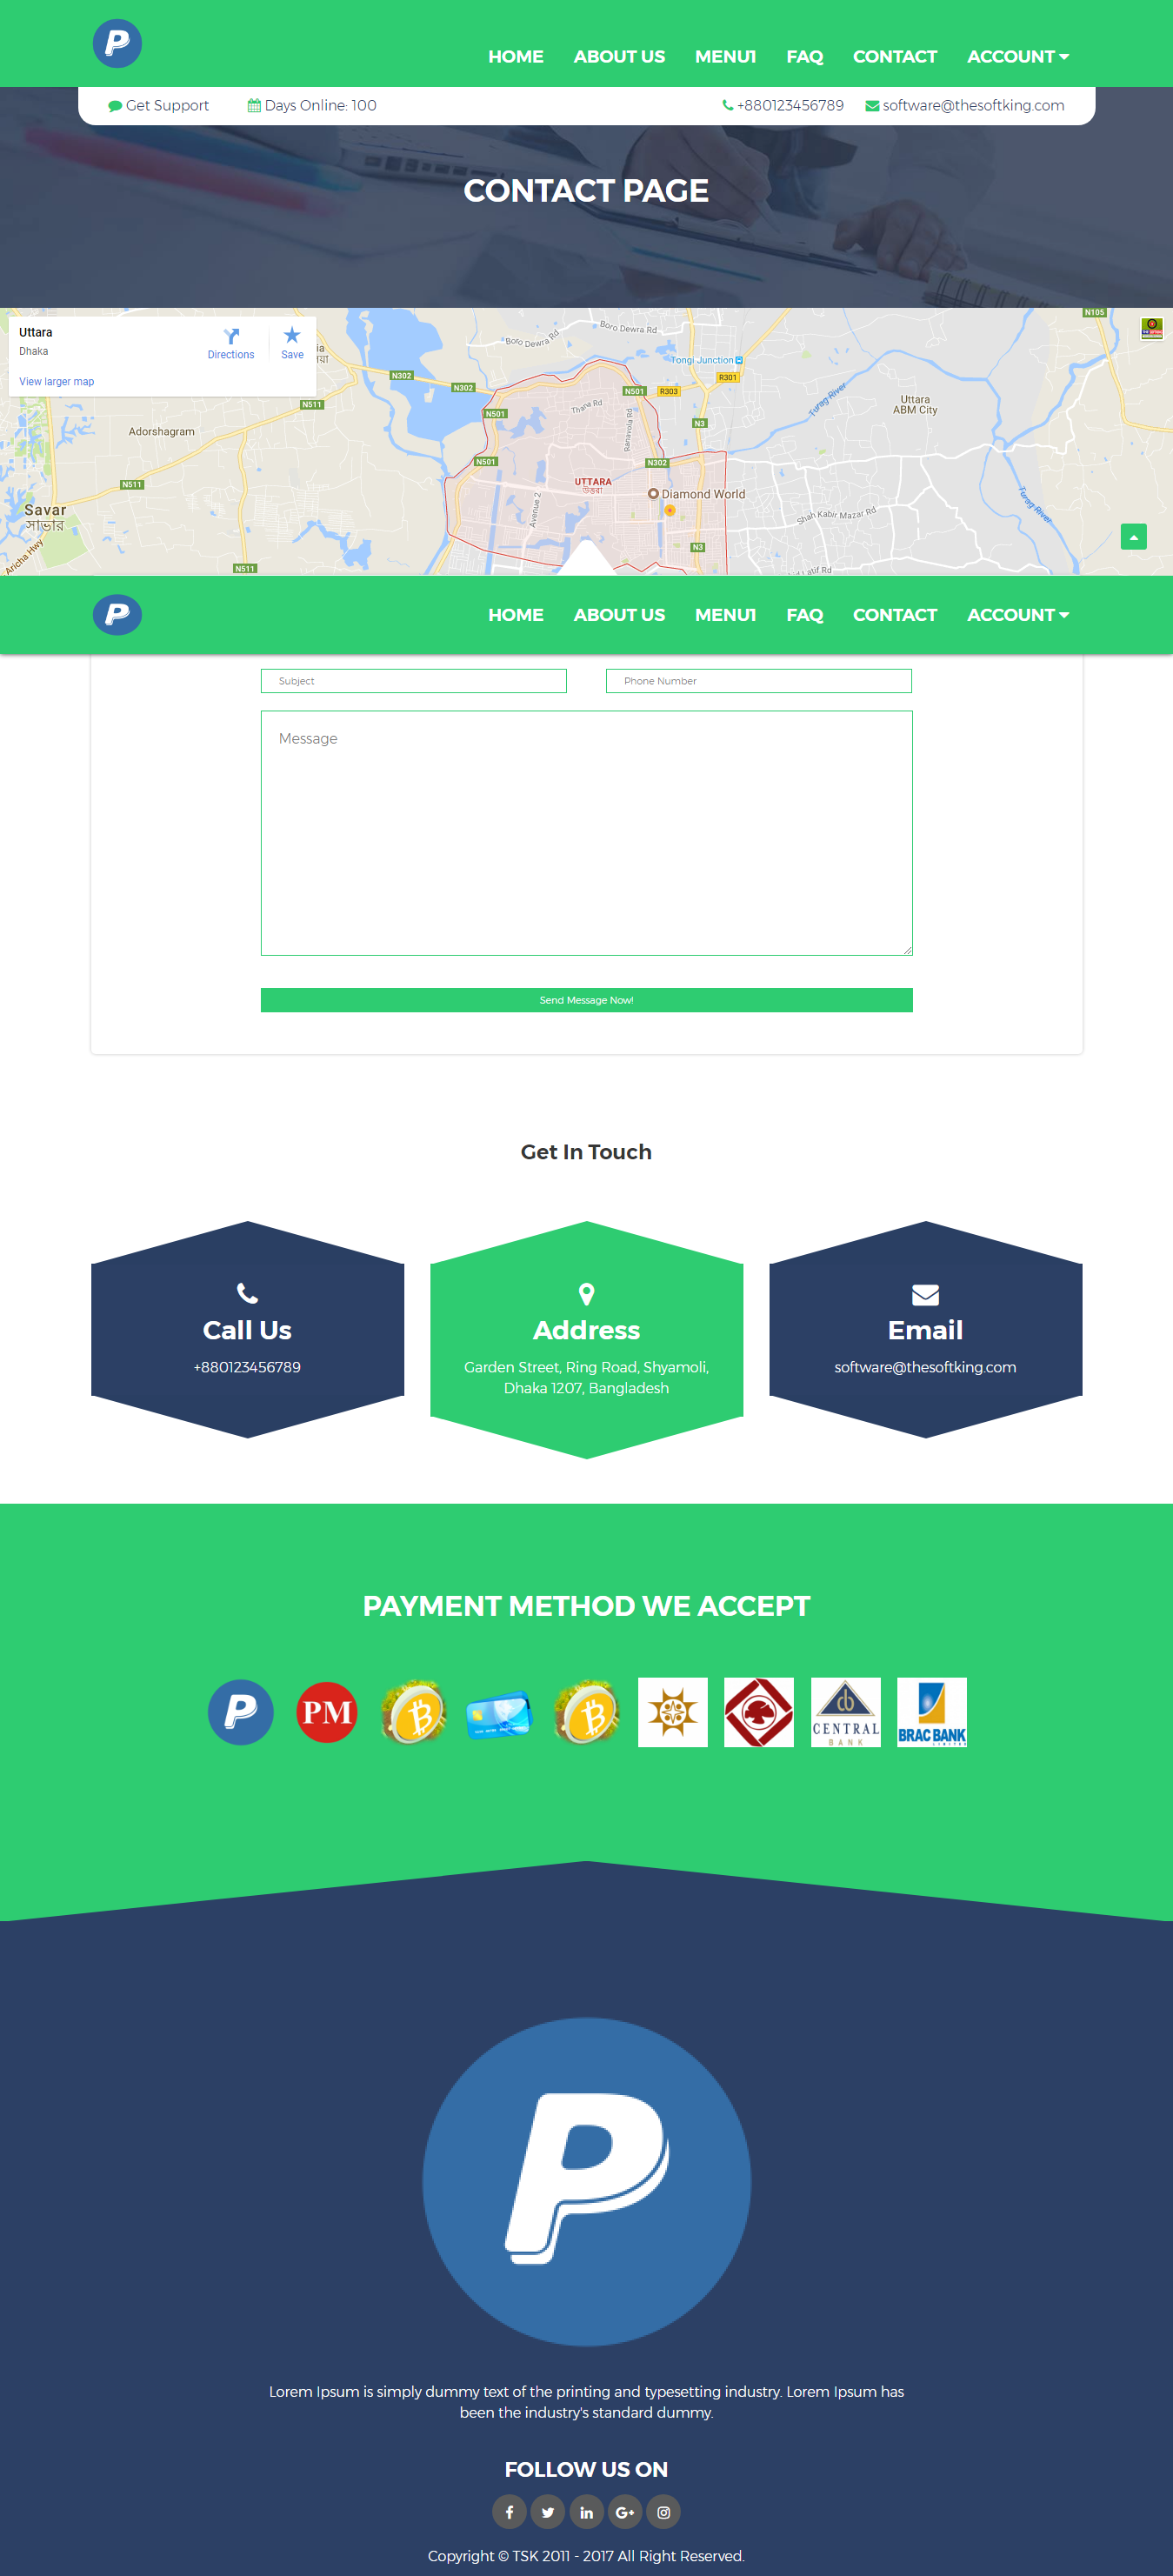 eTrade - Online Trading Platform